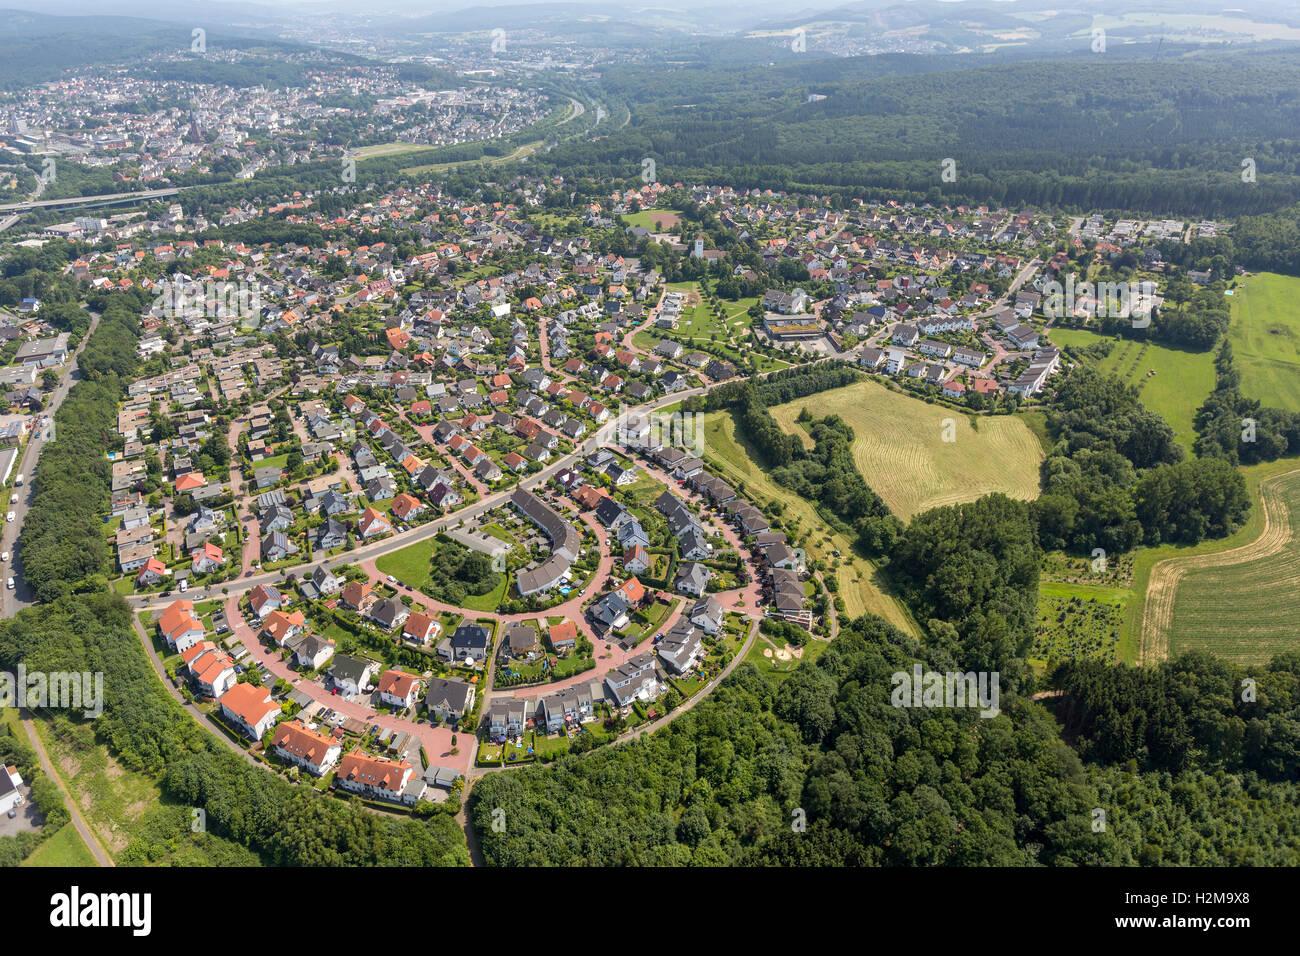 Aerial view, settlement Anton-pity path Bergheim, Aerial view of Arnsberg Sauerland, North Rhine-Westphalia, Germany, - Stock Image